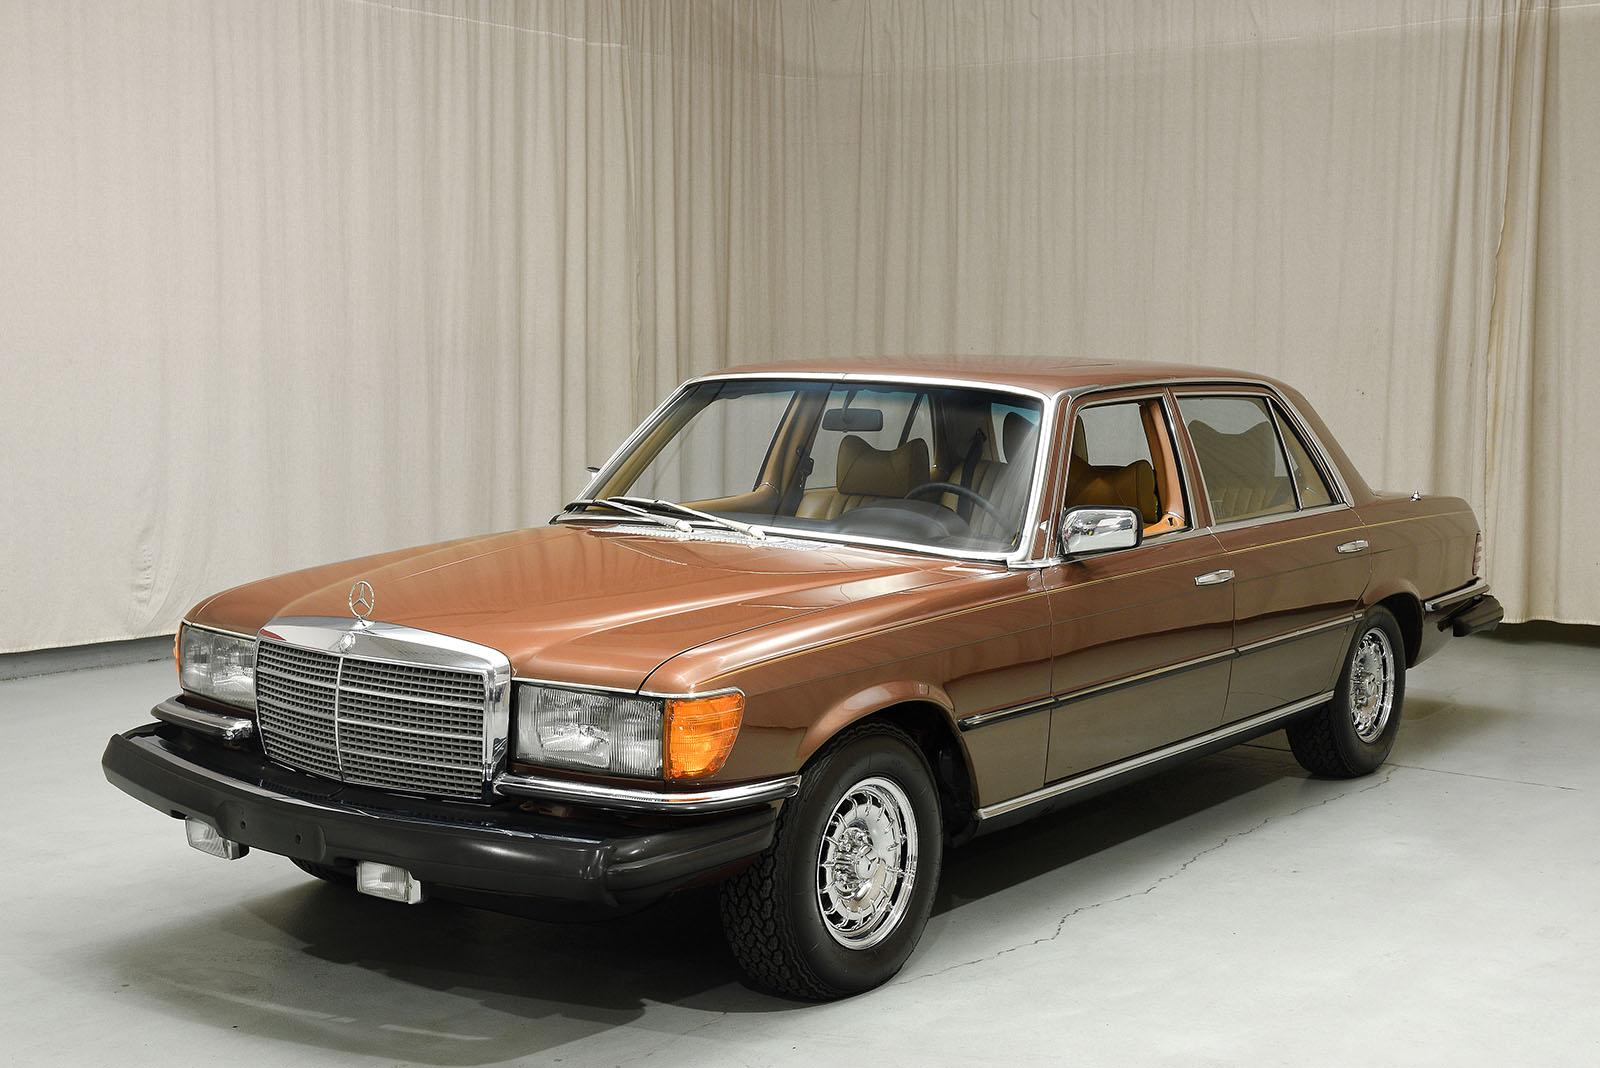 1979 mercedes benz 450 sel 6 9 sedan hyman ltd classic cars. Black Bedroom Furniture Sets. Home Design Ideas